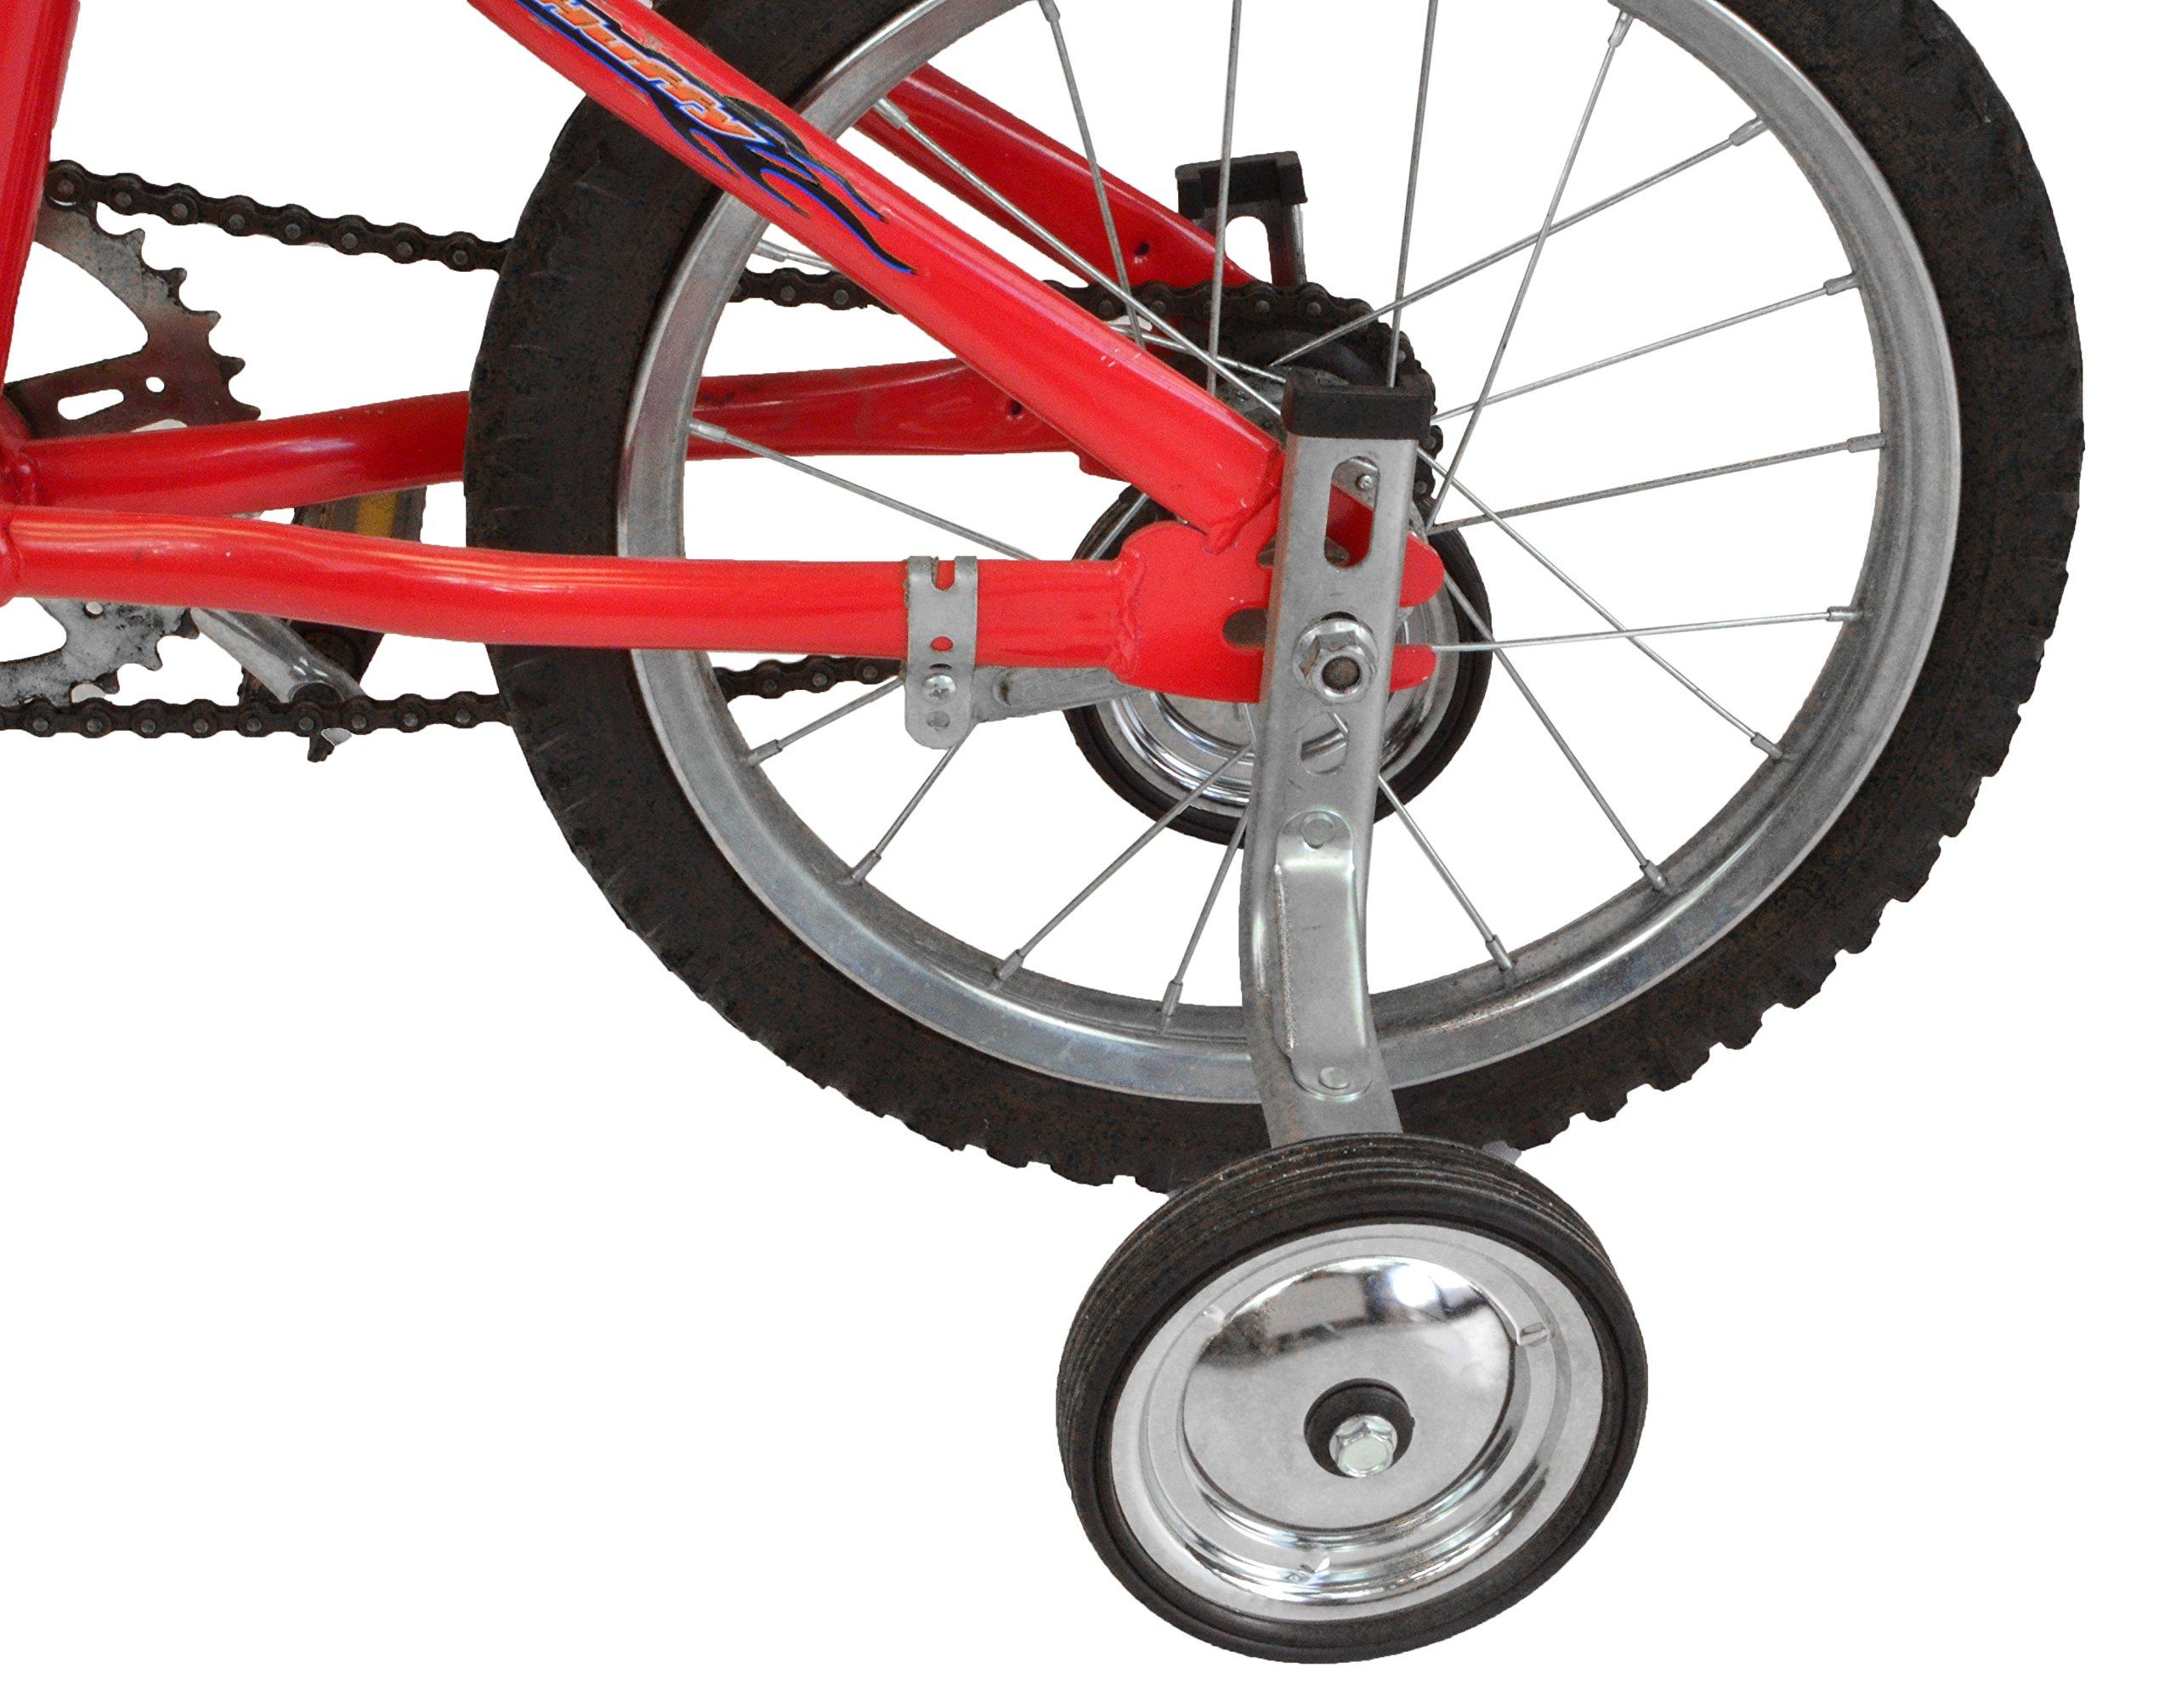 Lumintrail Children's Bicycle Training Wheels 12-18 Inch Kids Bike Stabilizer by Lumintrail (Image #1)